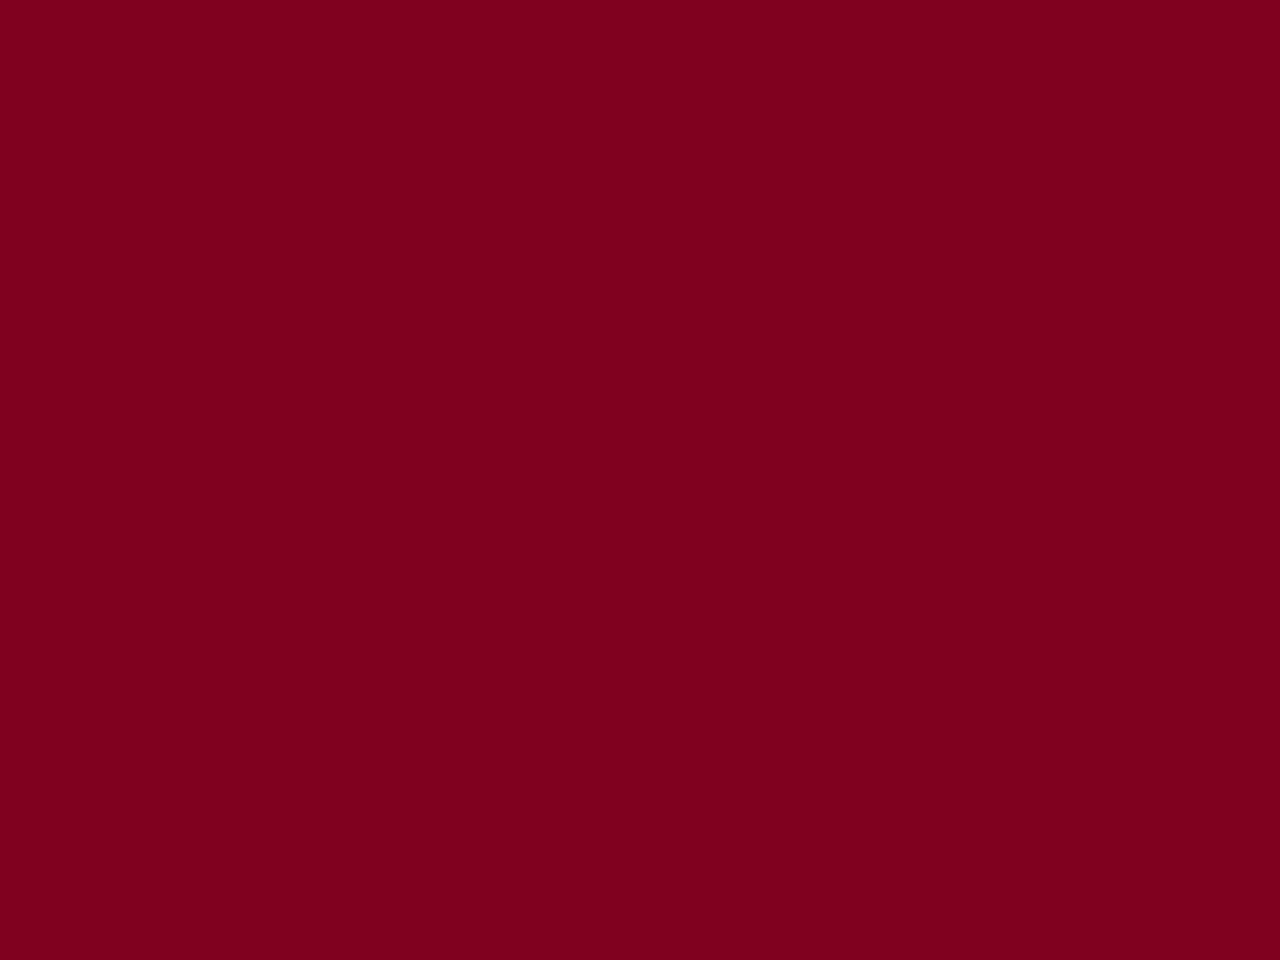 1280x960 Burgundy Solid Color Background